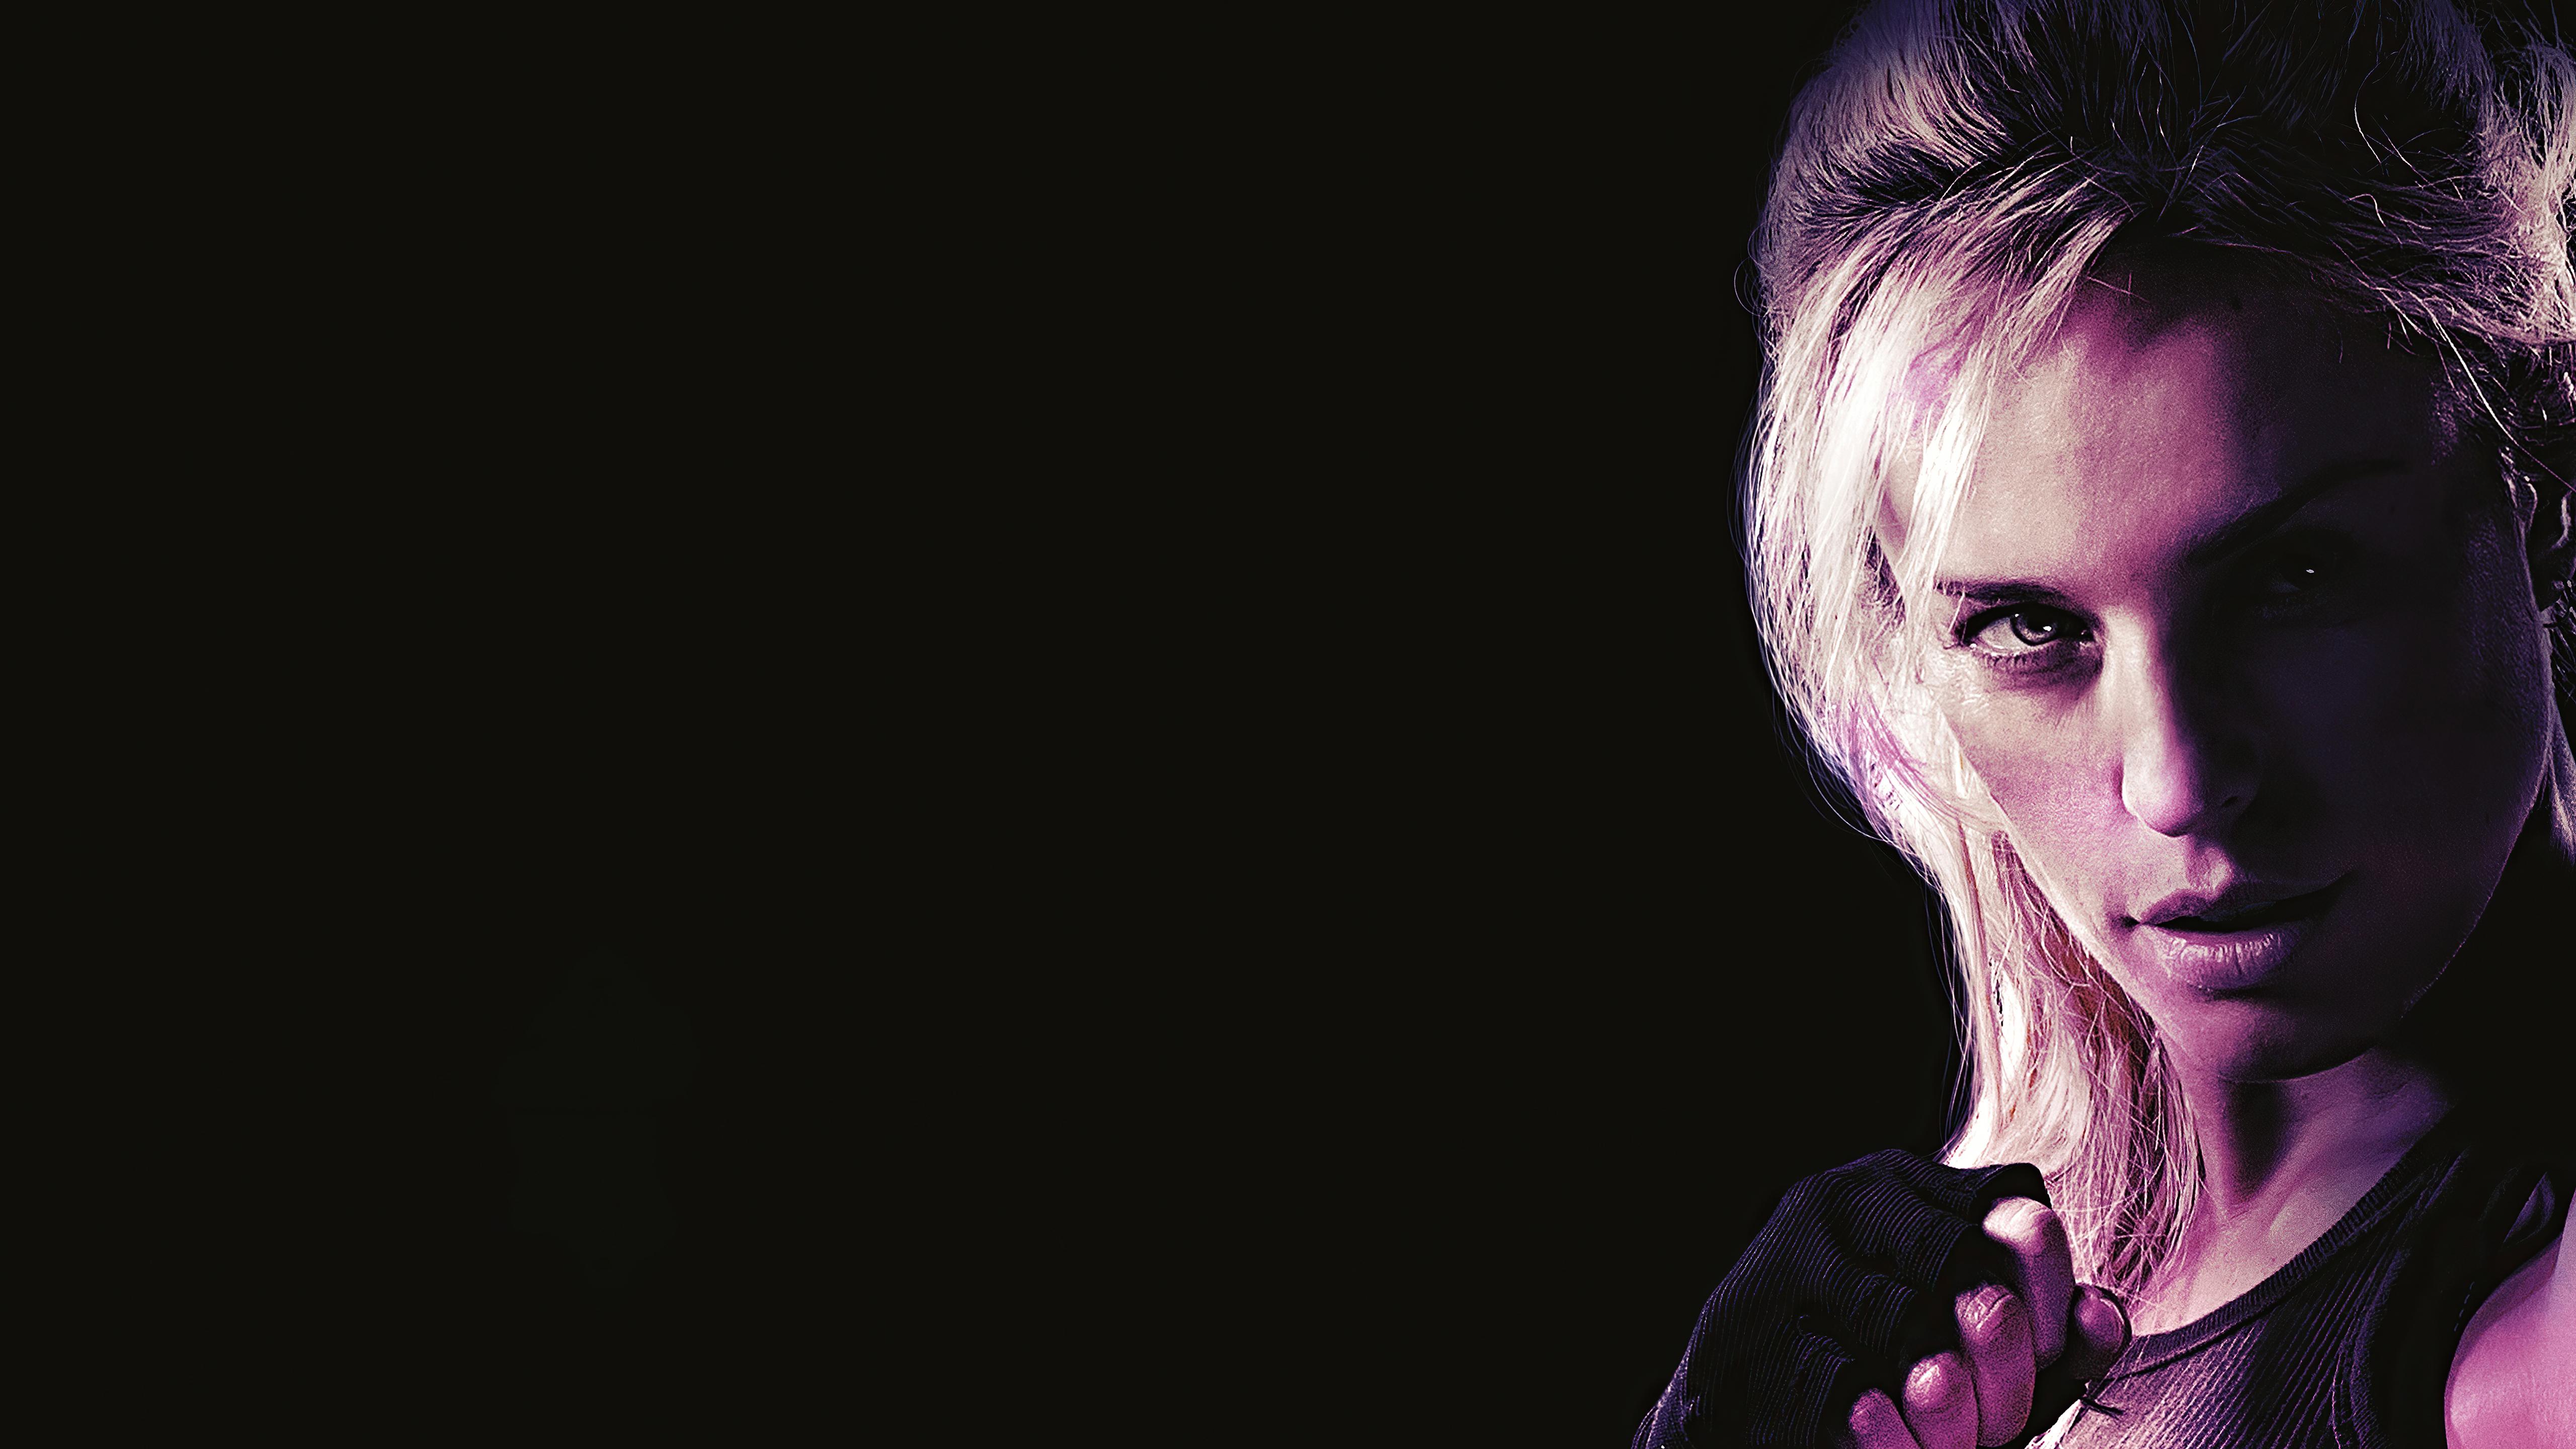 jessica mcnamee as sonya blade mortal kombat movie 4k 1617449109 - Jessica McNamee As Sonya Blade Mortal Kombat Movie 4k - Jessica McNamee As Sonya Blade Mortal Kombat Movie 4k wallpapers